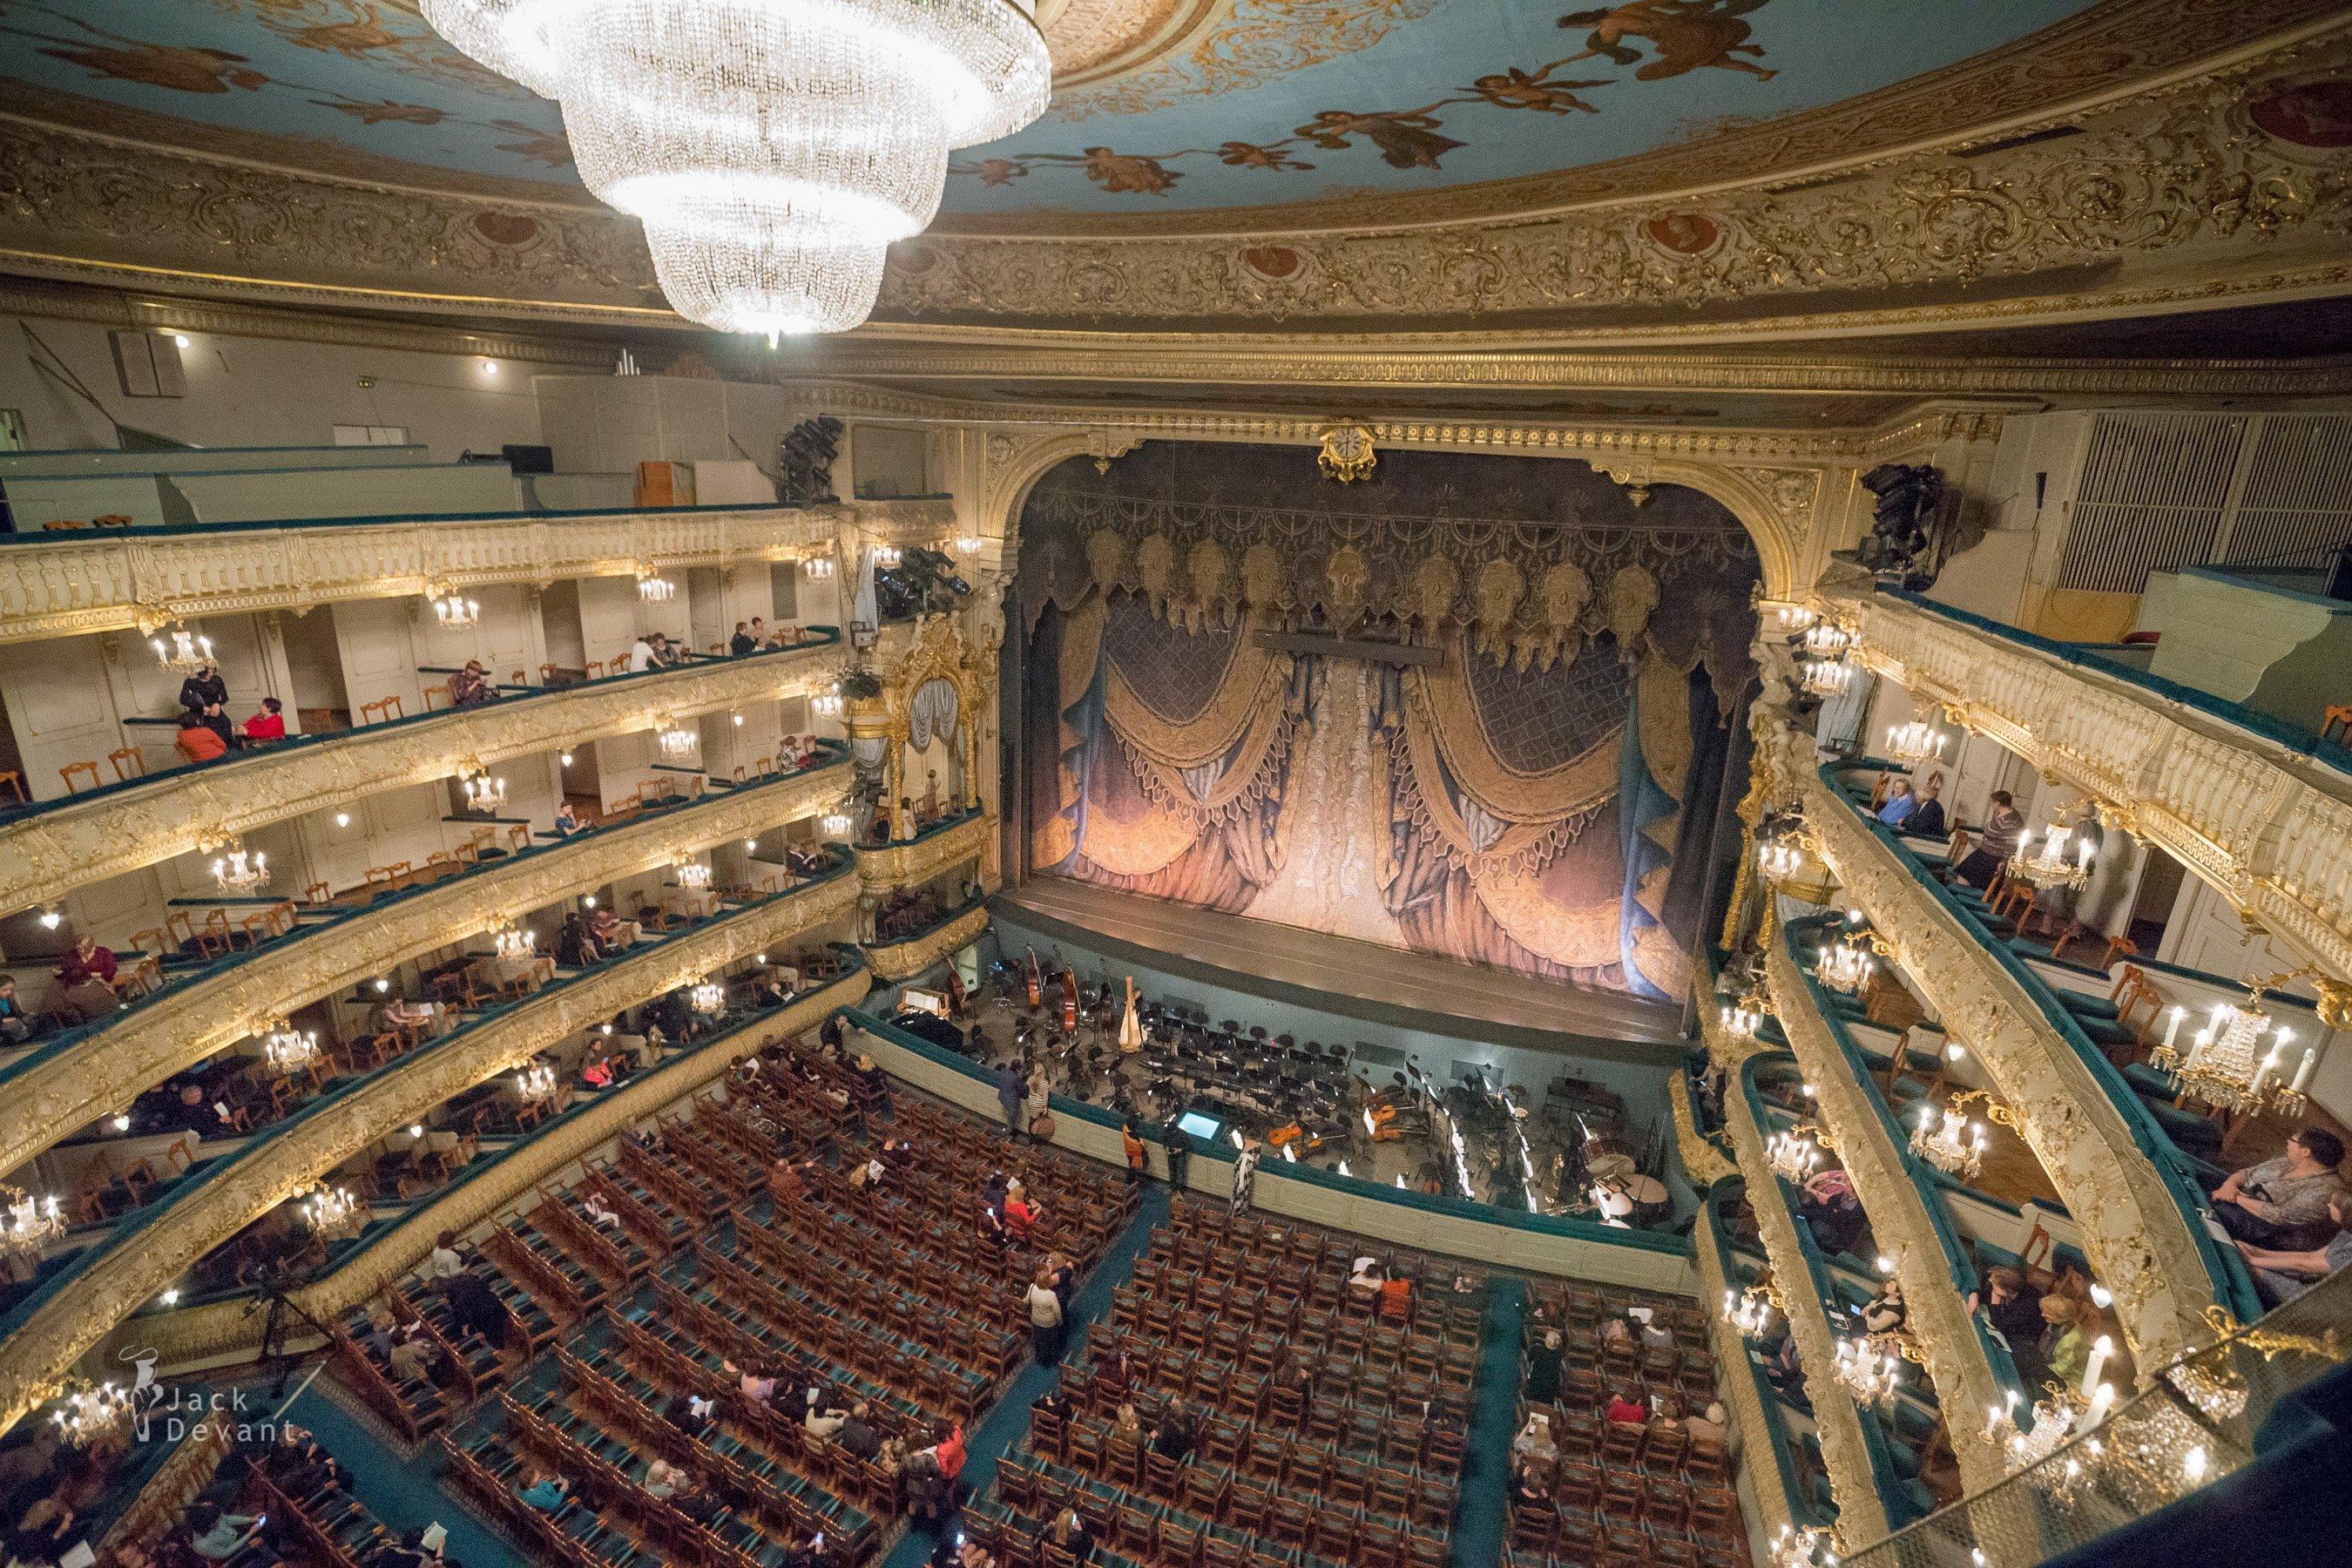 Jack-Devant-Mariinsky-Theatre-102